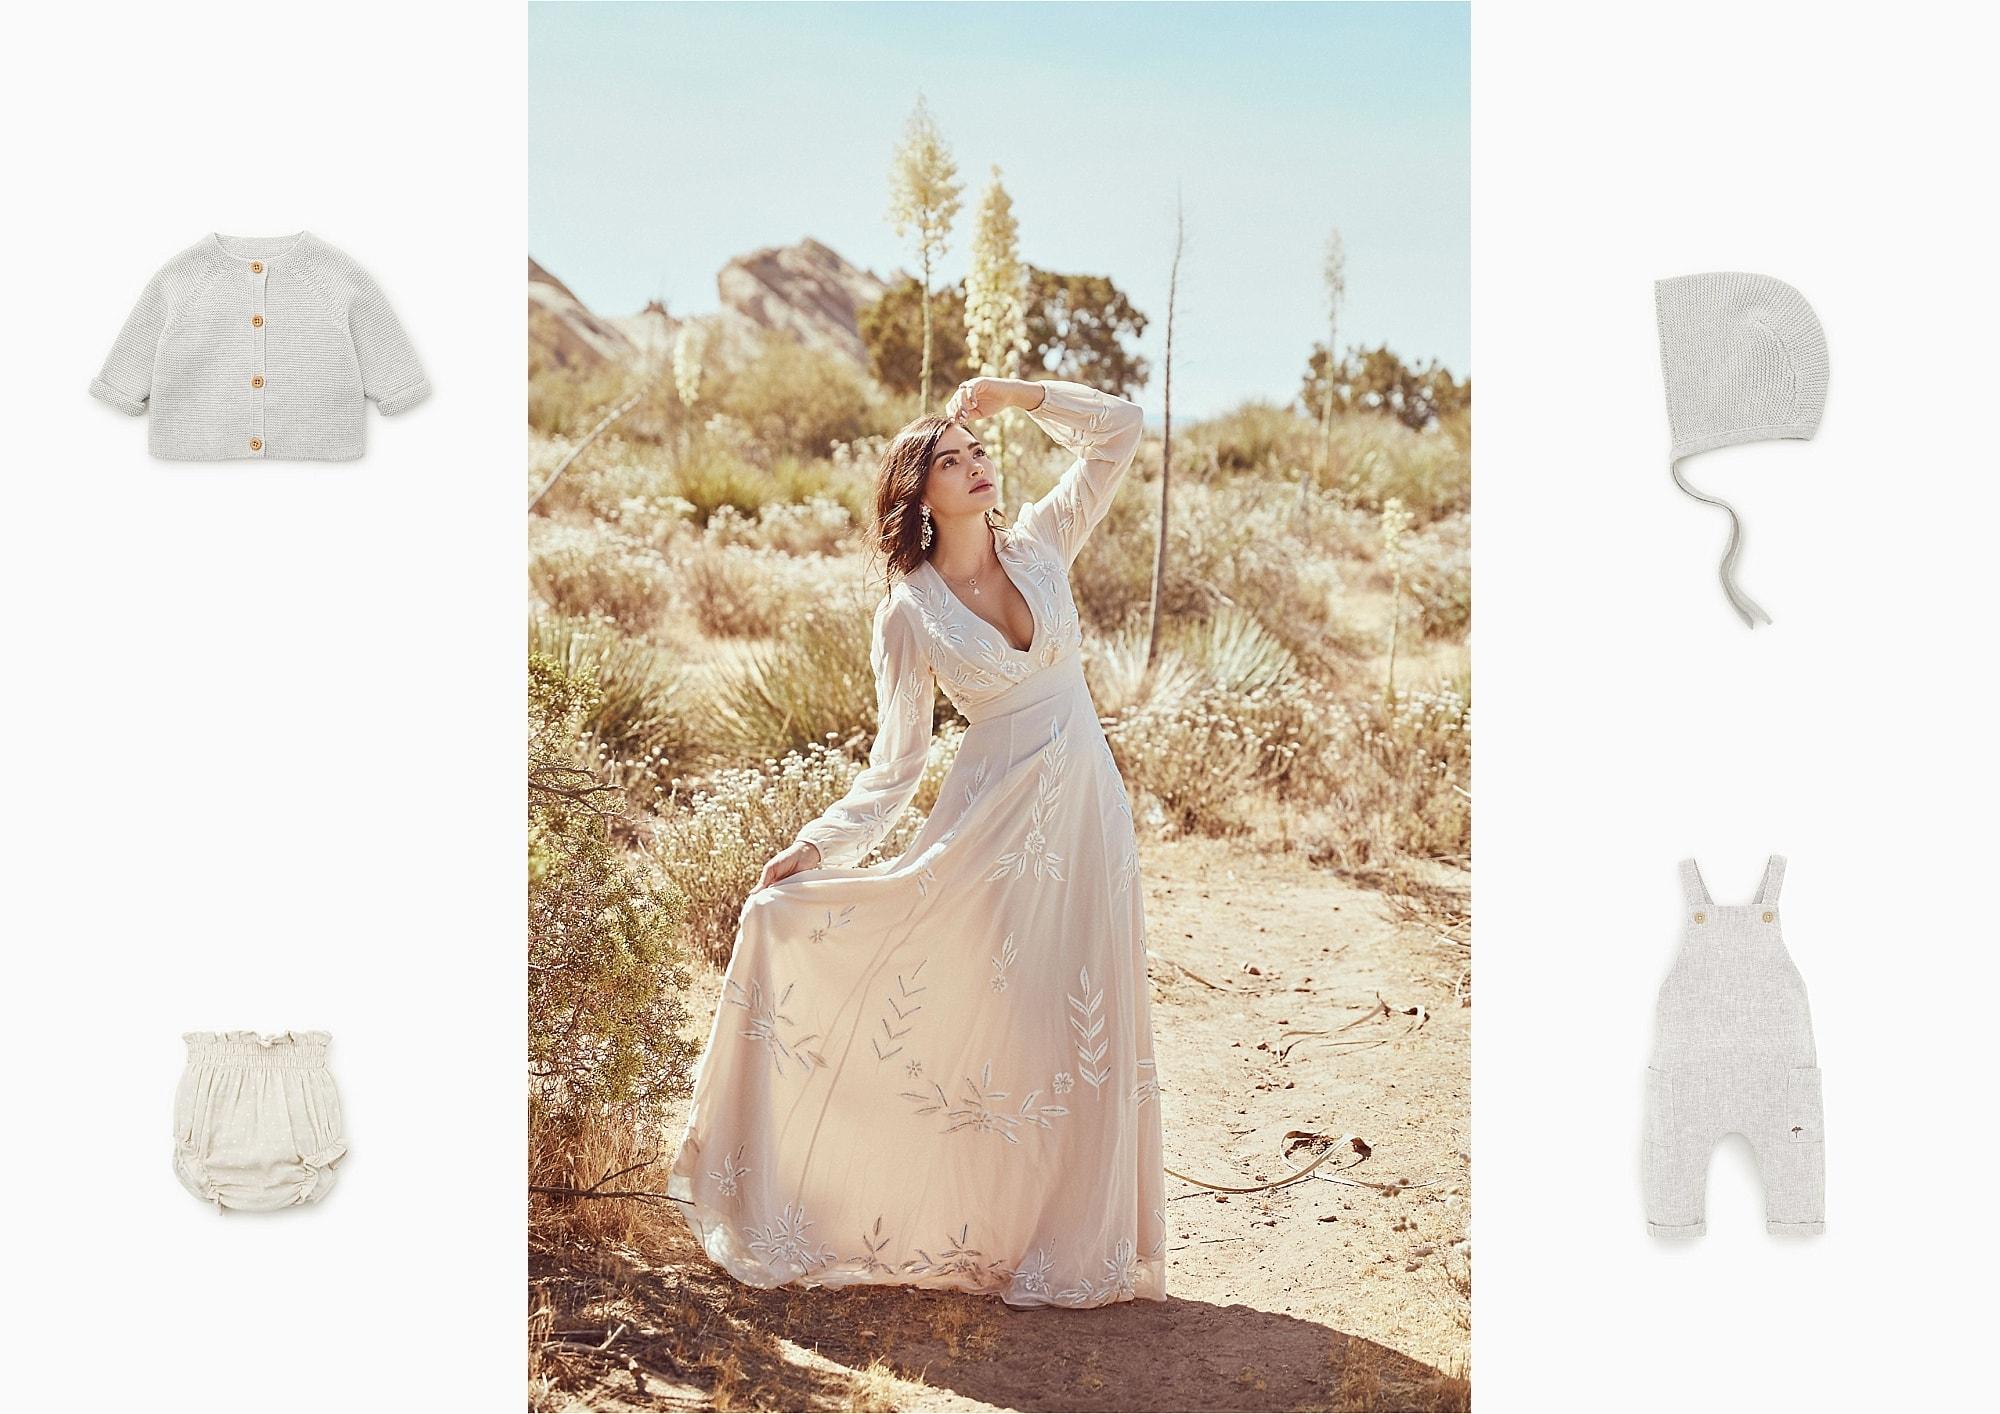 Motherhood Photography Wardrobe Inspiration